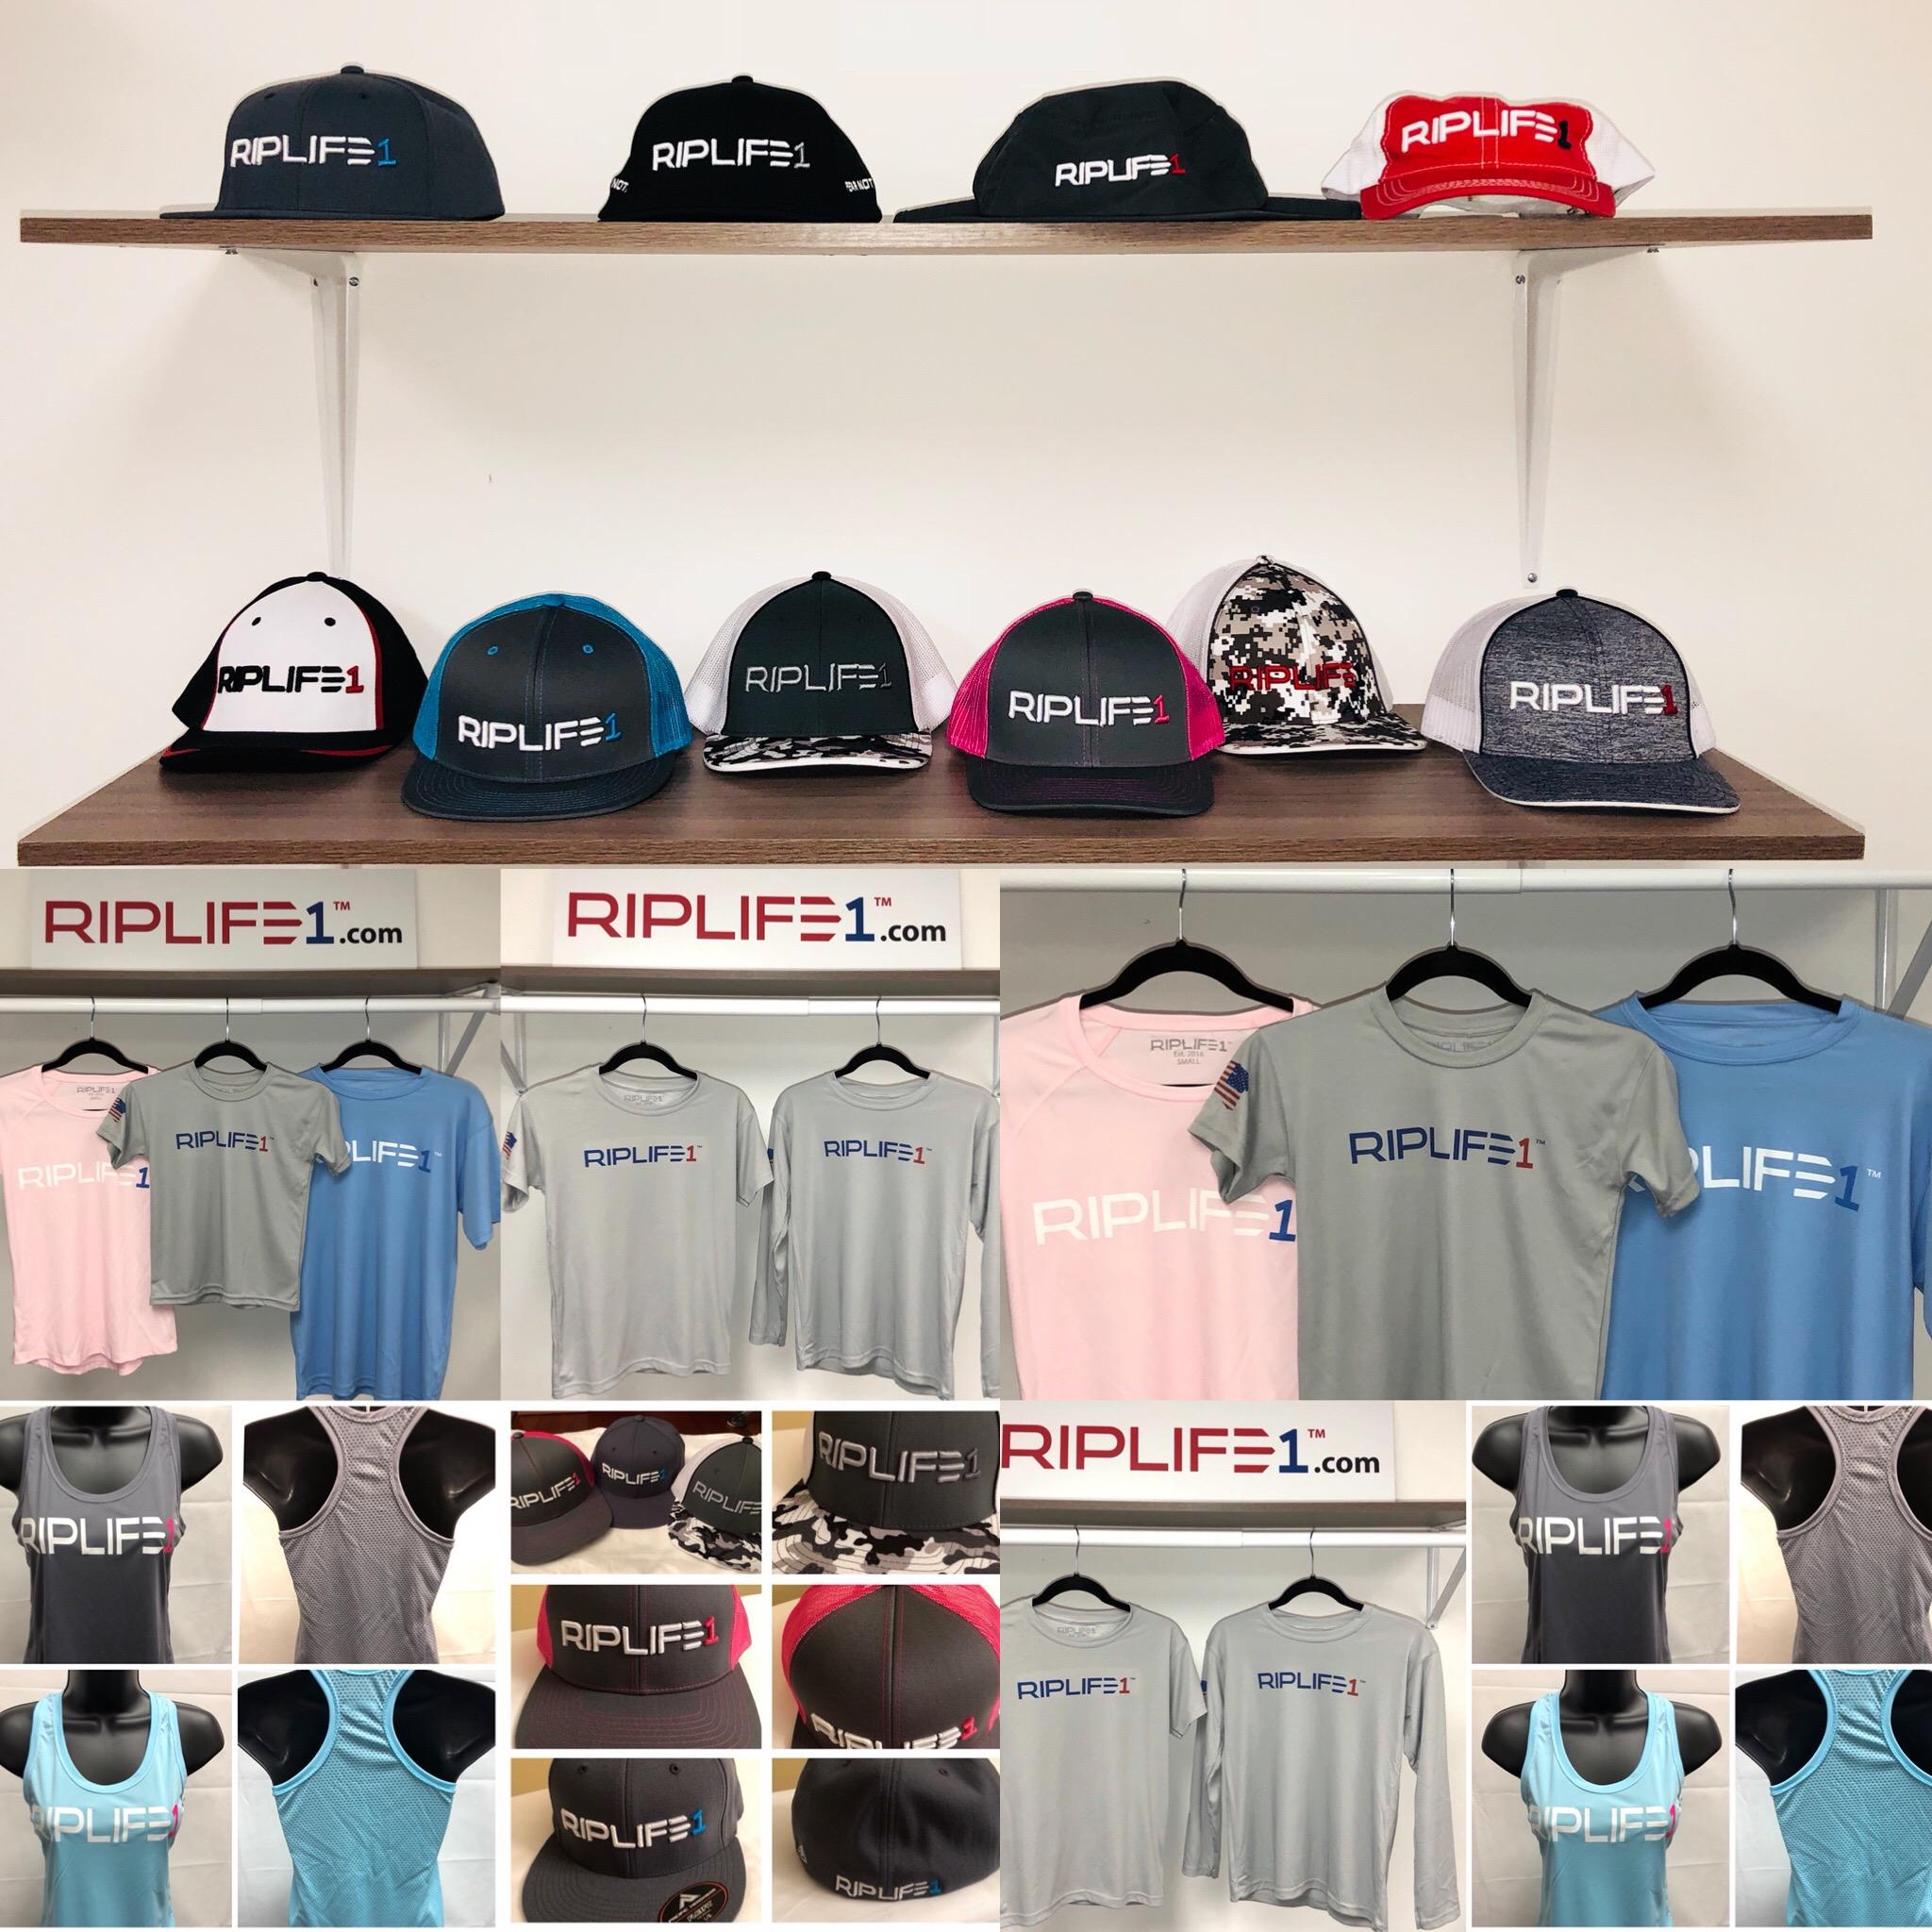 RIPLIFE1